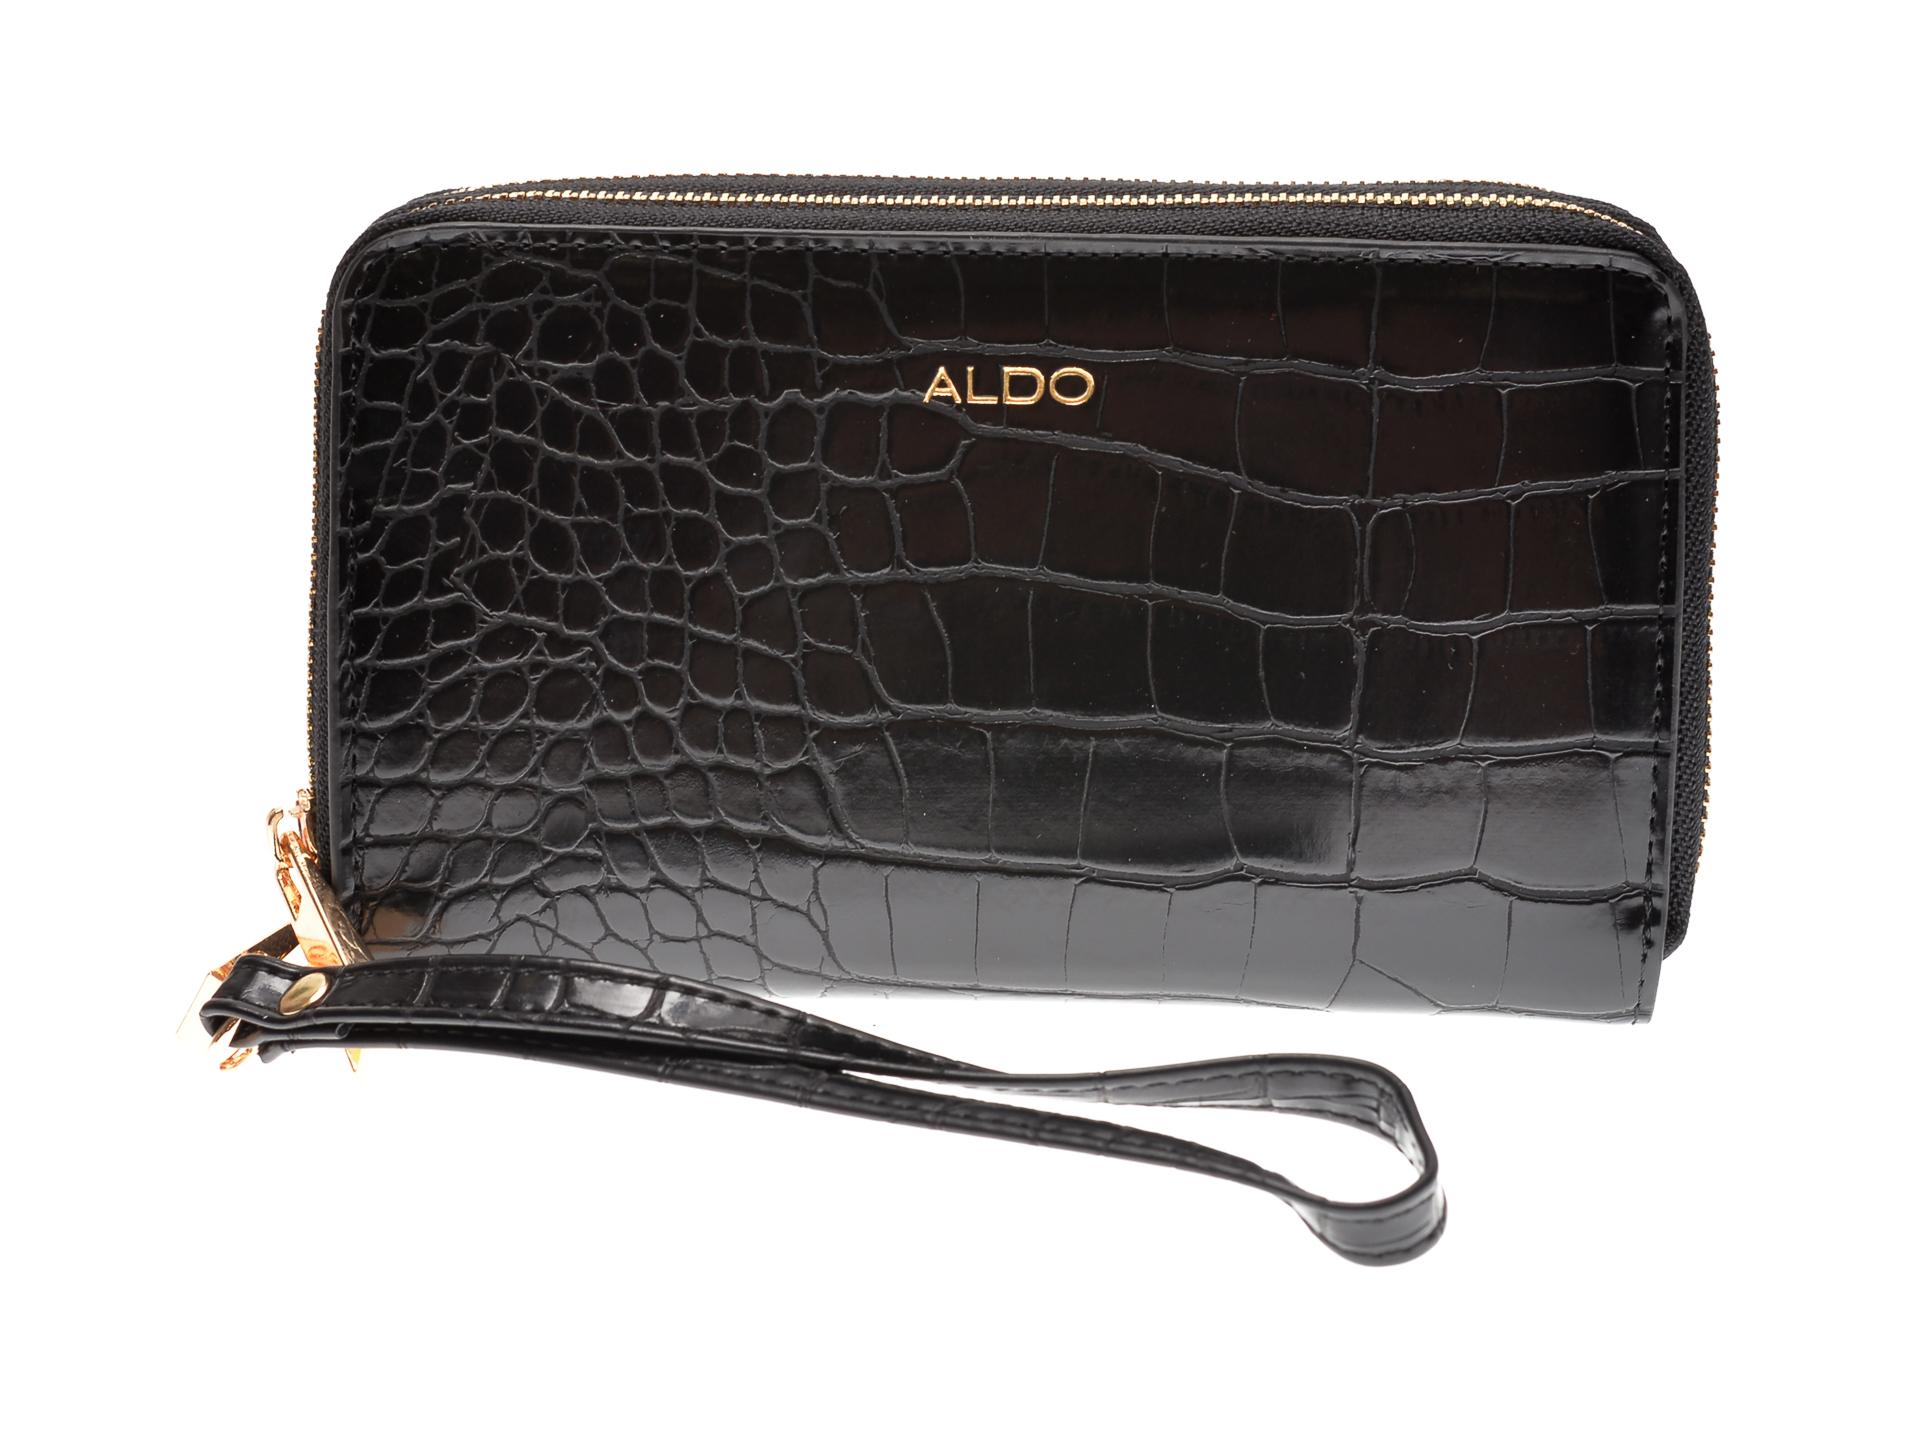 Portofel ALDO negru, 12905393, din piele ecologica